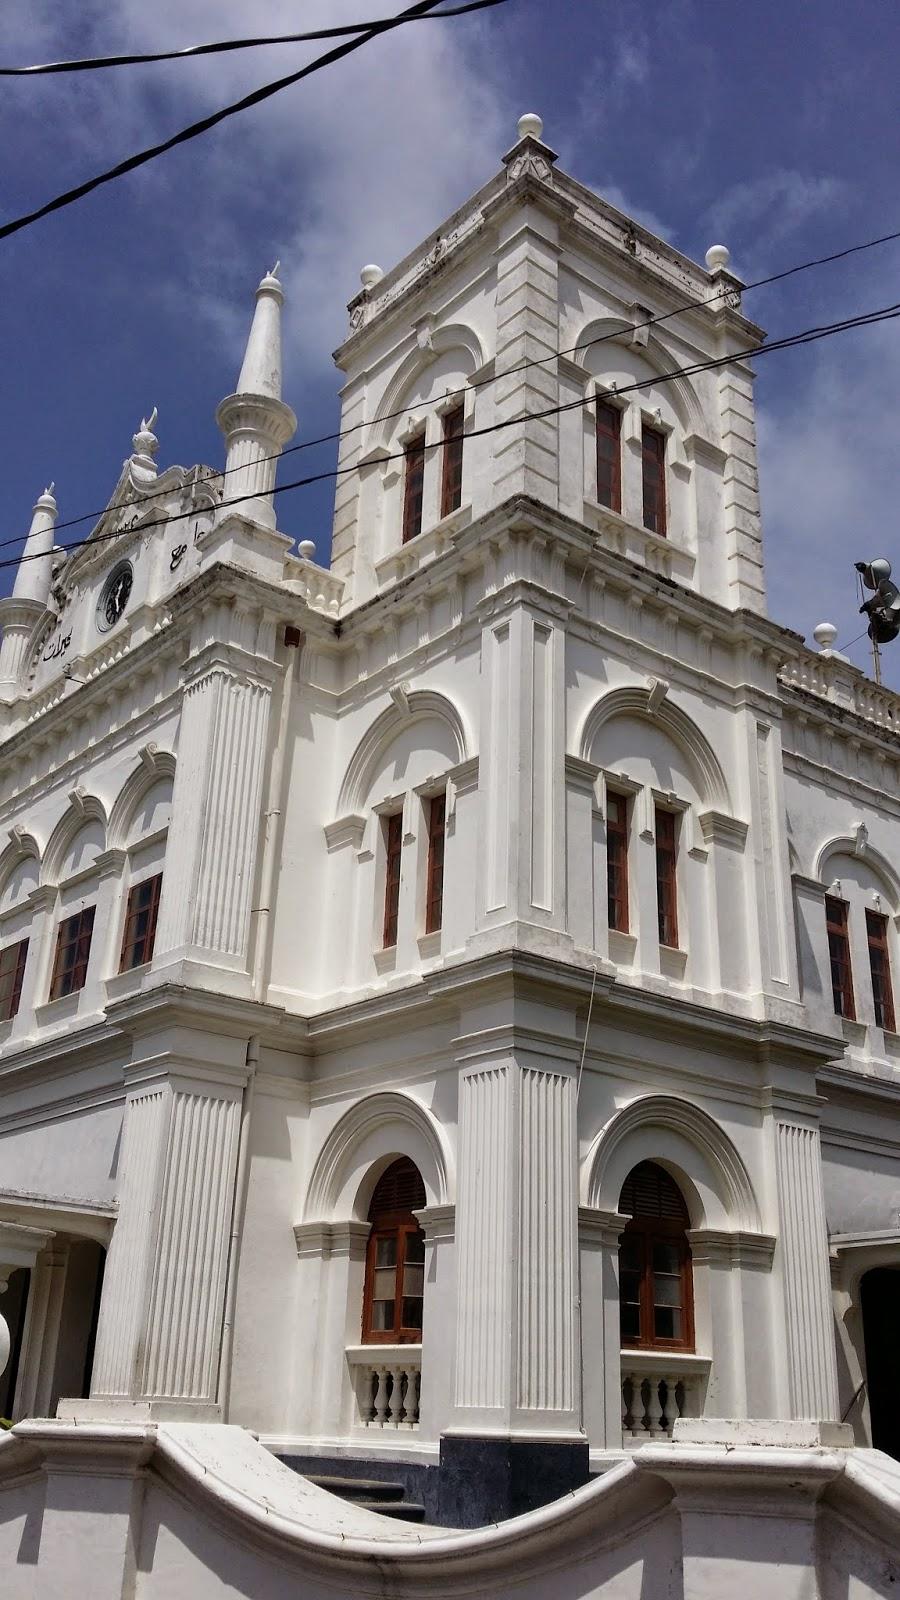 Mezquita Rampart St en Galle (Sri Lanka)